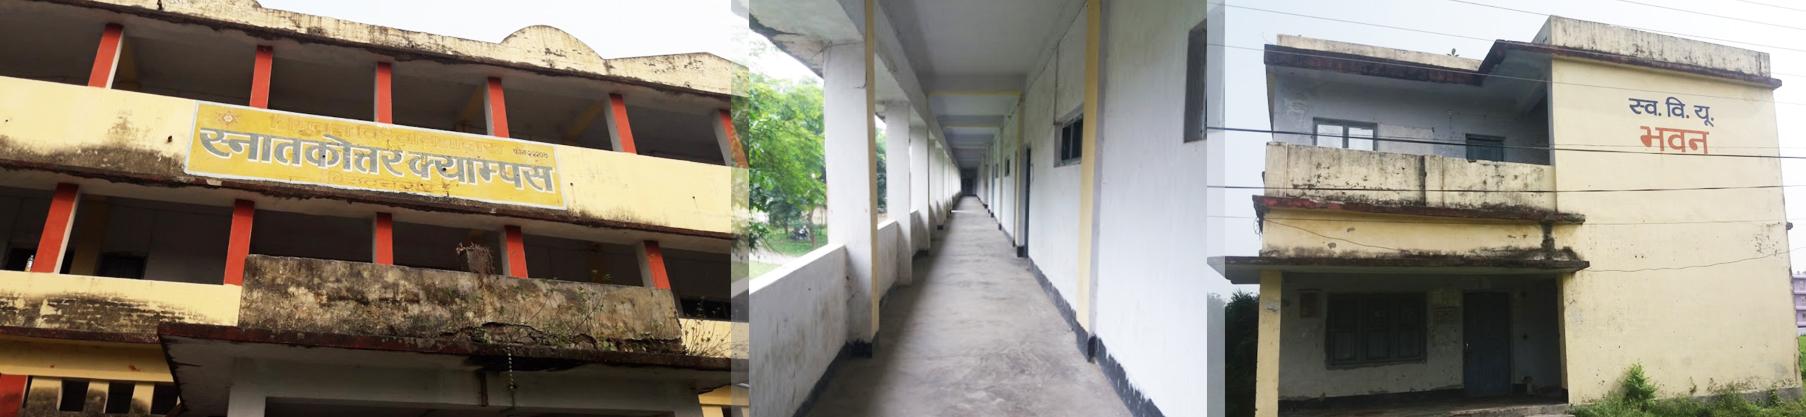 Post Graduate (Degree) Campus Biratnagar